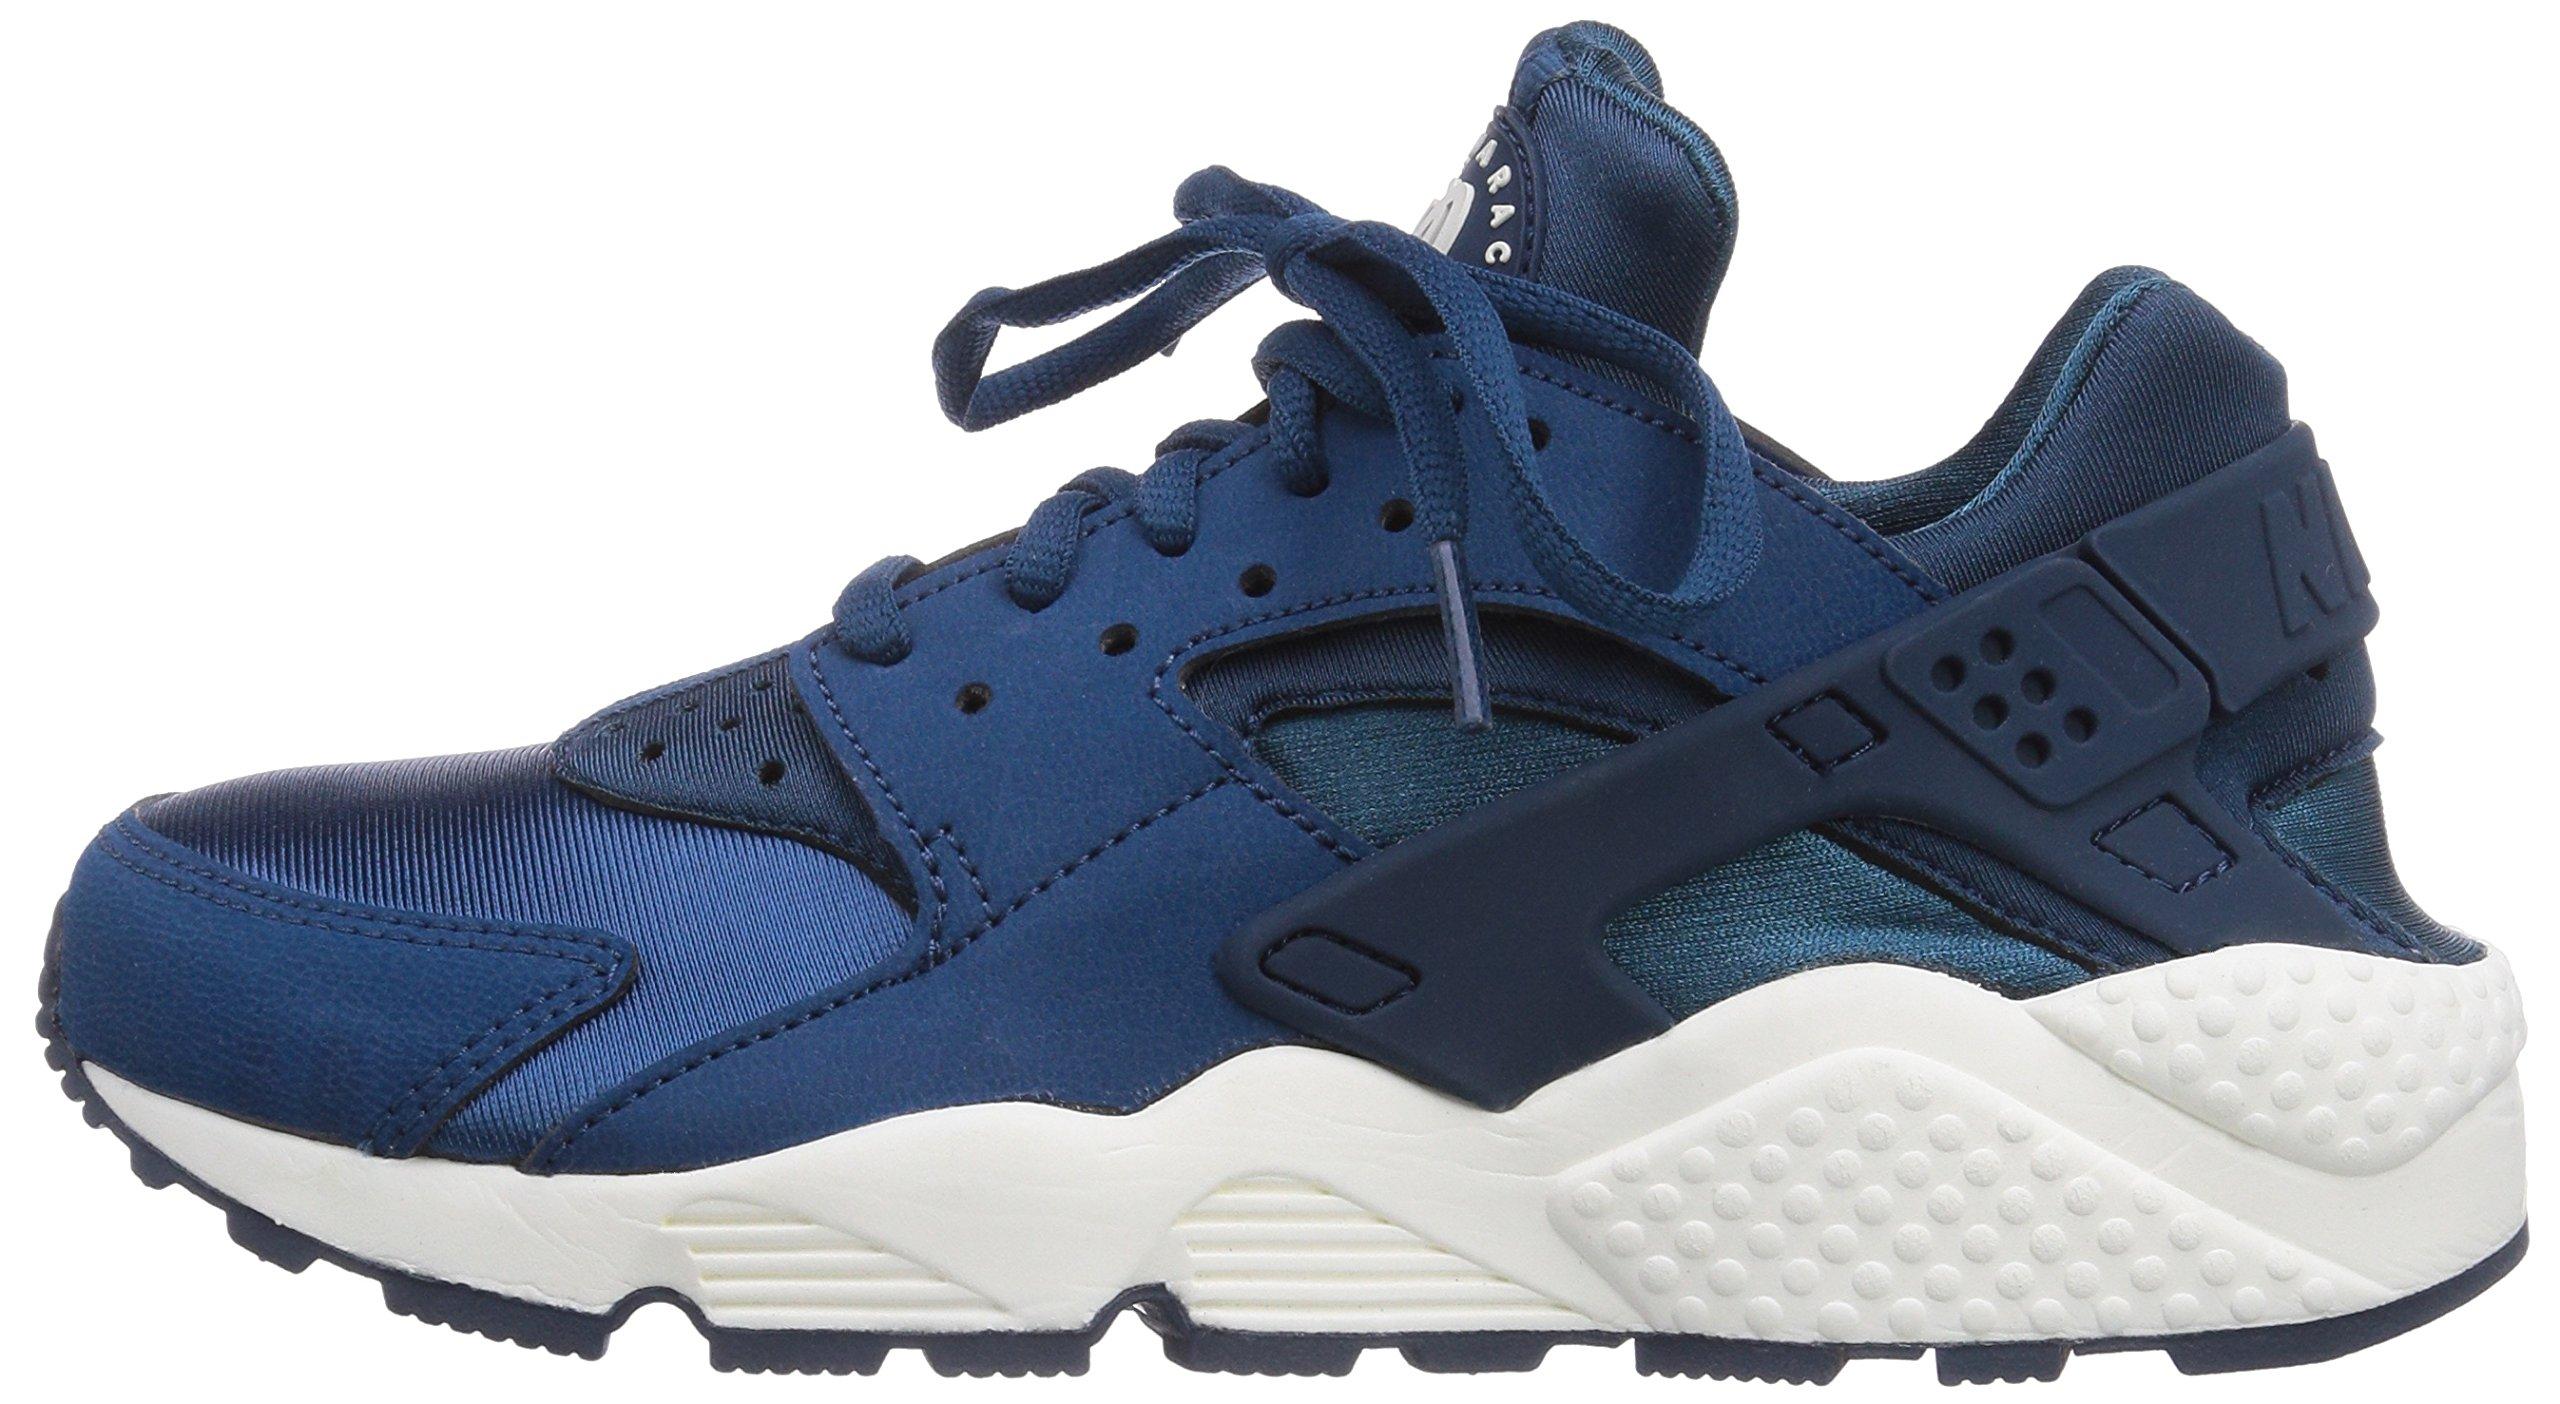 nike womens air huarache trainers 634835 sneakers shoes (UK 3 us 5.5 EU 36, blue force blue force sail 400) by NIKE (Image #5)